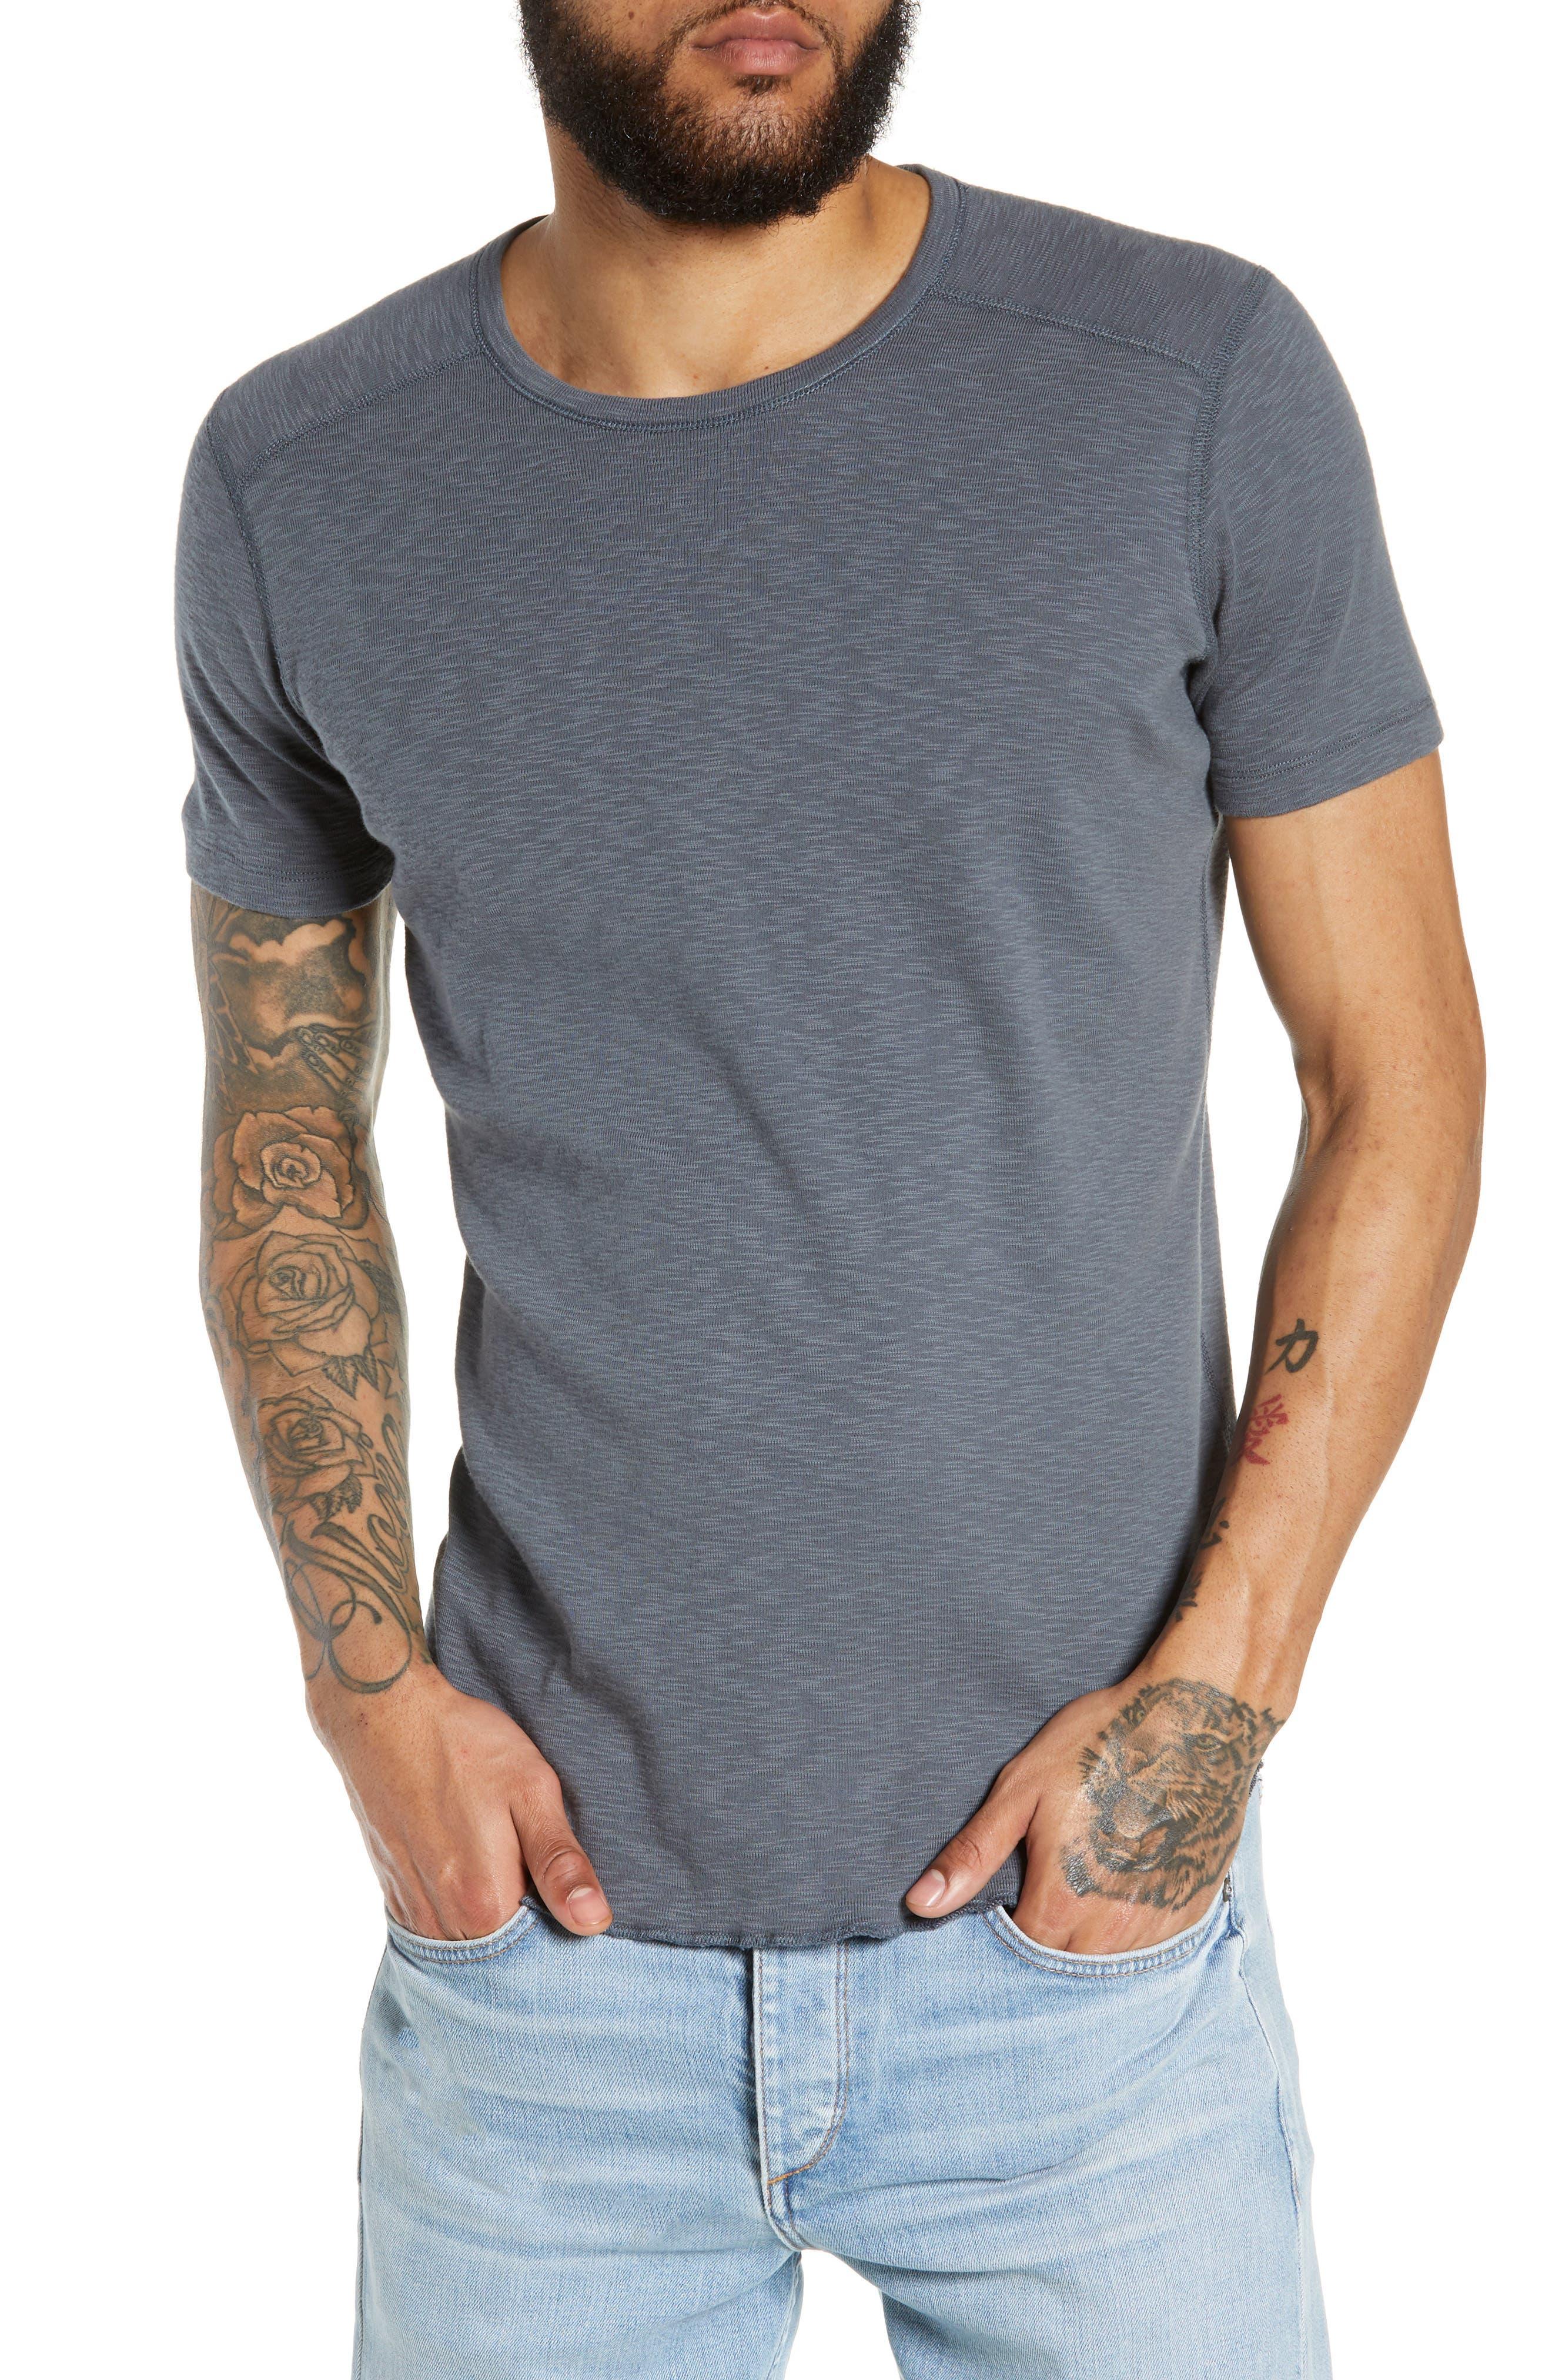 WINGS + HORNS Ribbed Slub Cotton T-Shirt, Main, color, SHADOW